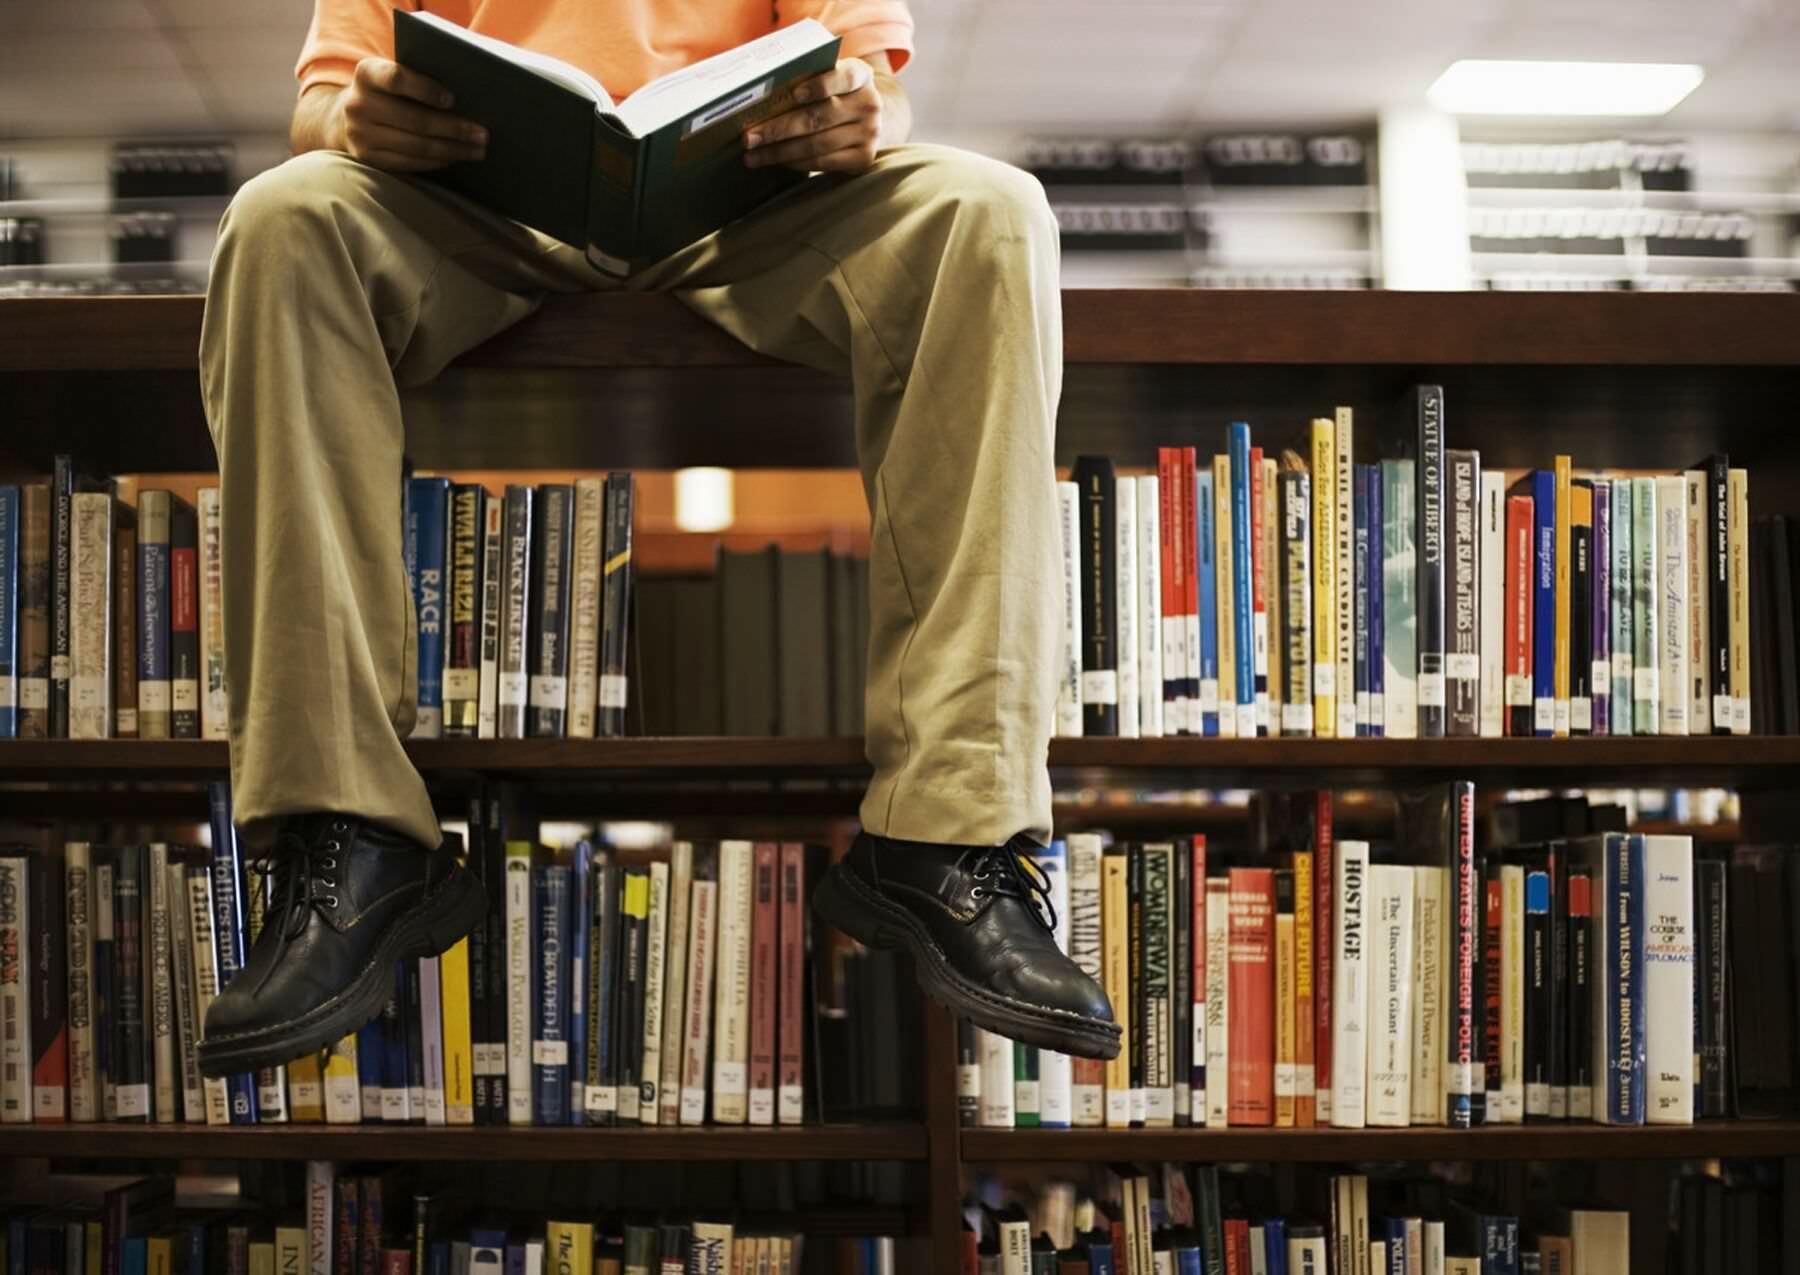 Читает на стелаже с книгами